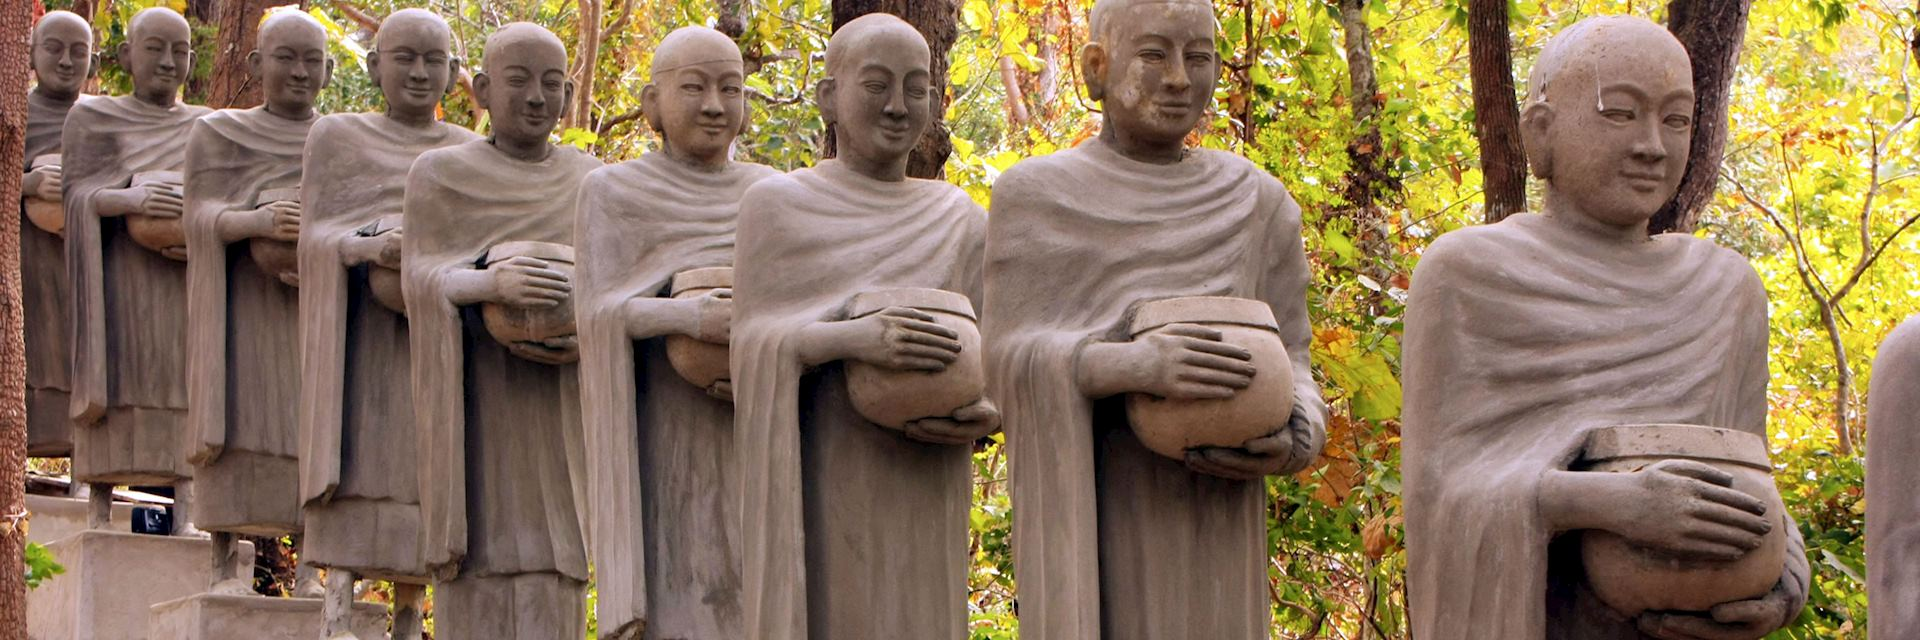 Buddha statues, Kratie